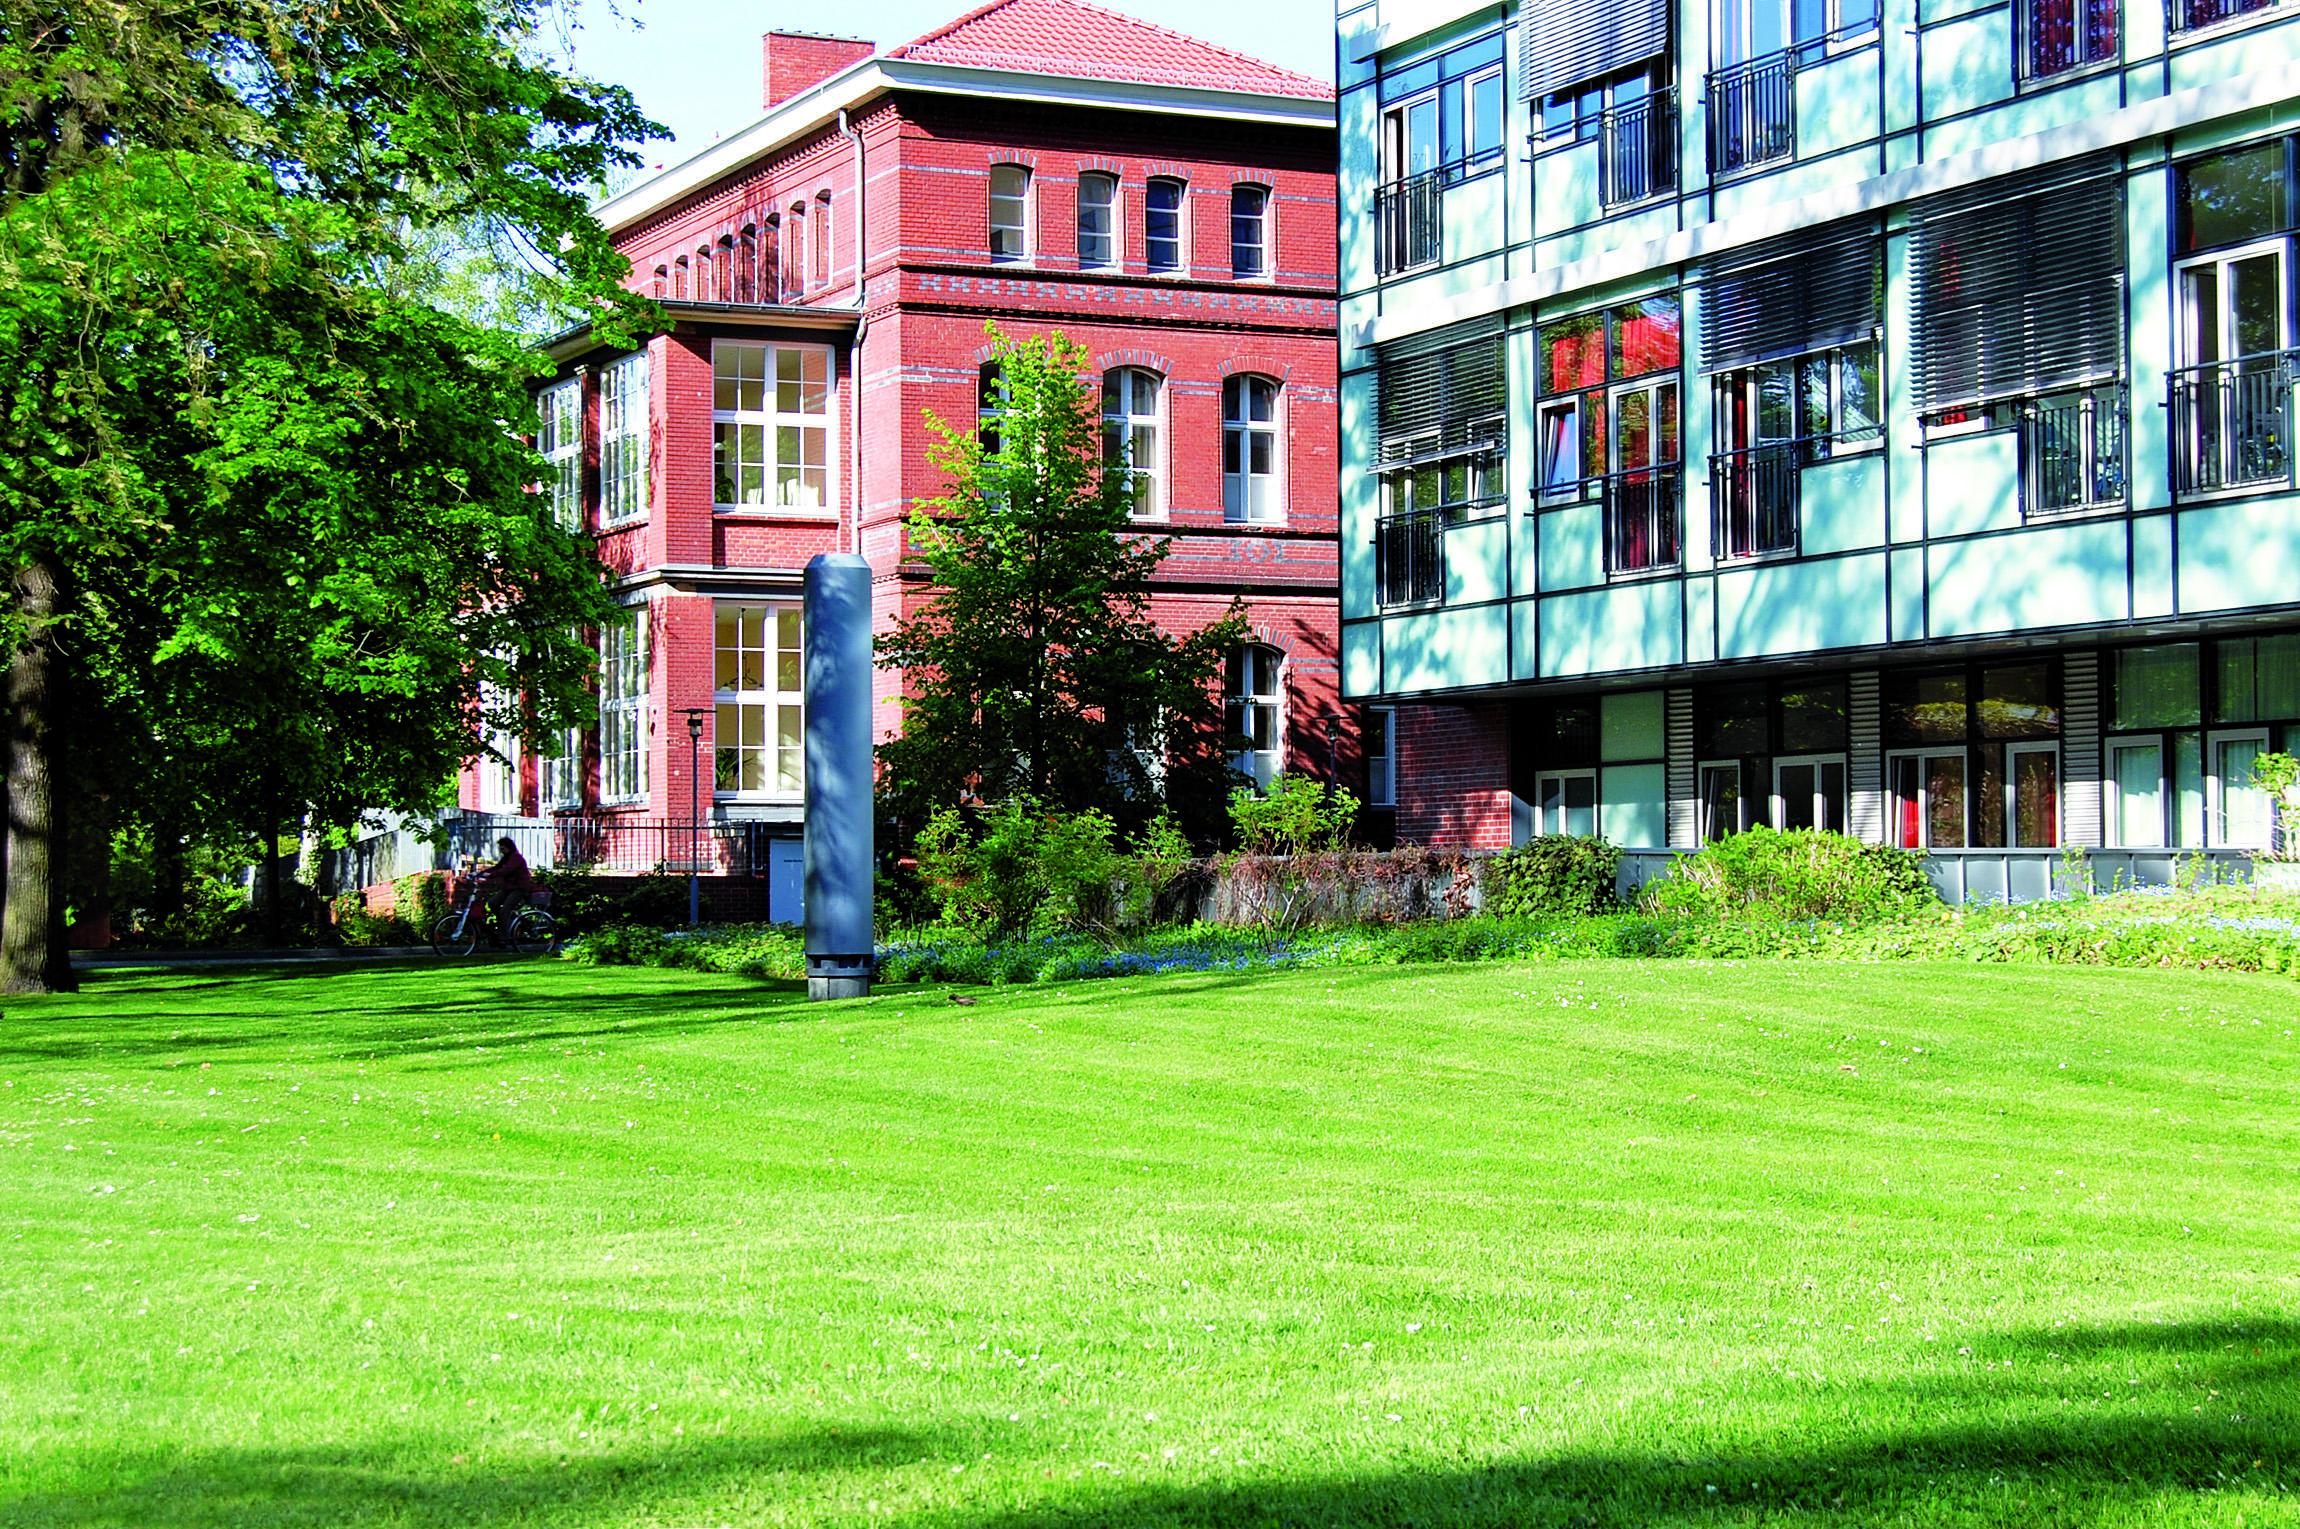 Evangelisches Geriatriezentrum Berlin gGmbH